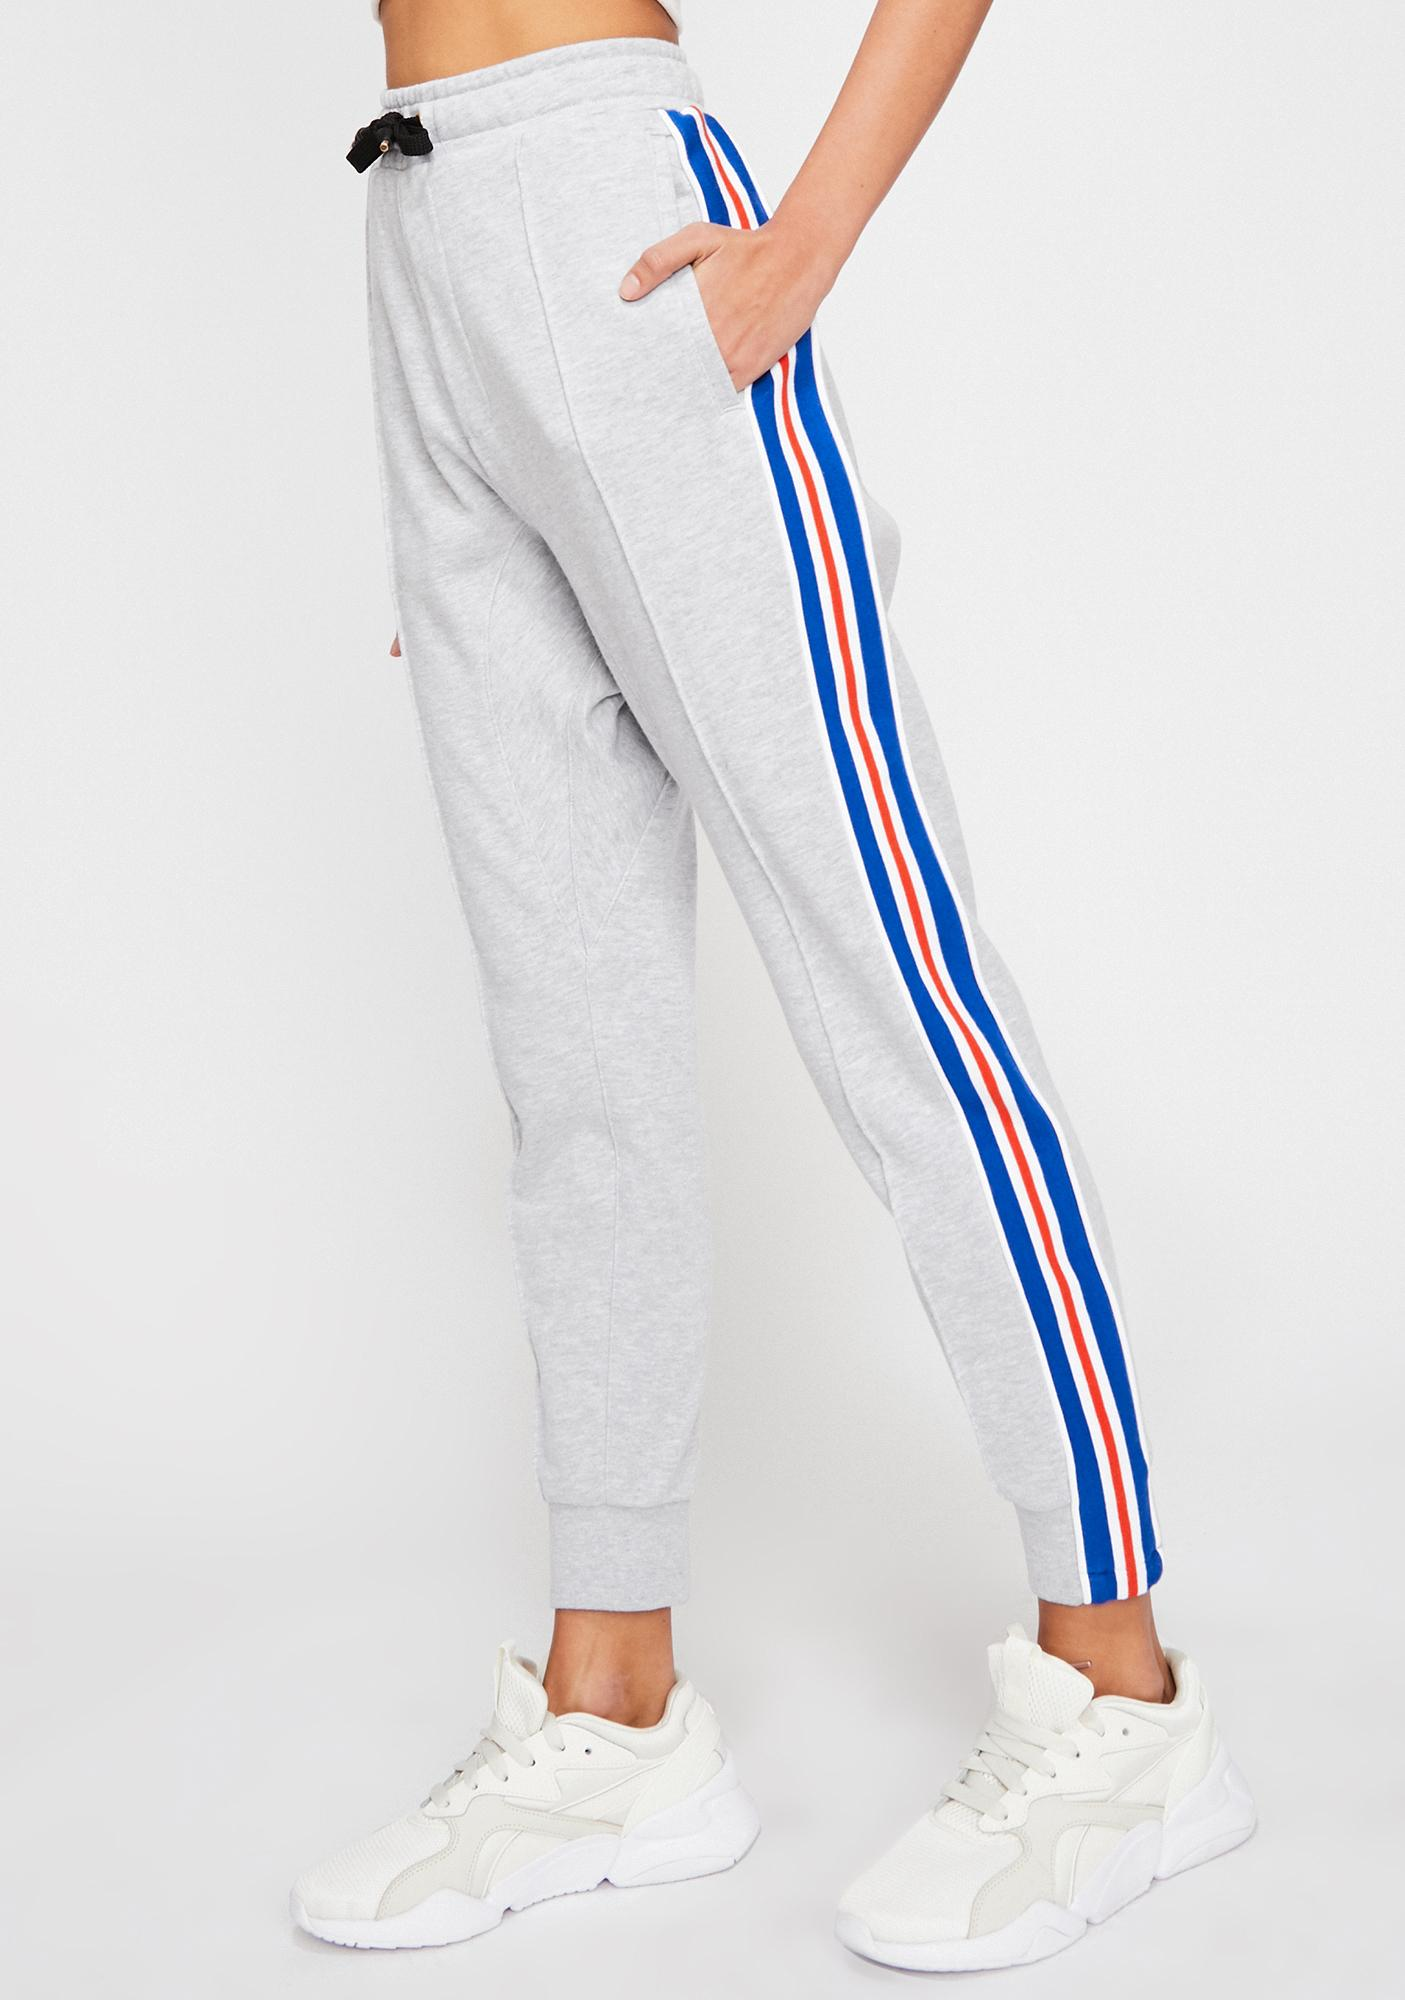 Go Faster Stripe Jogger Sweatpants